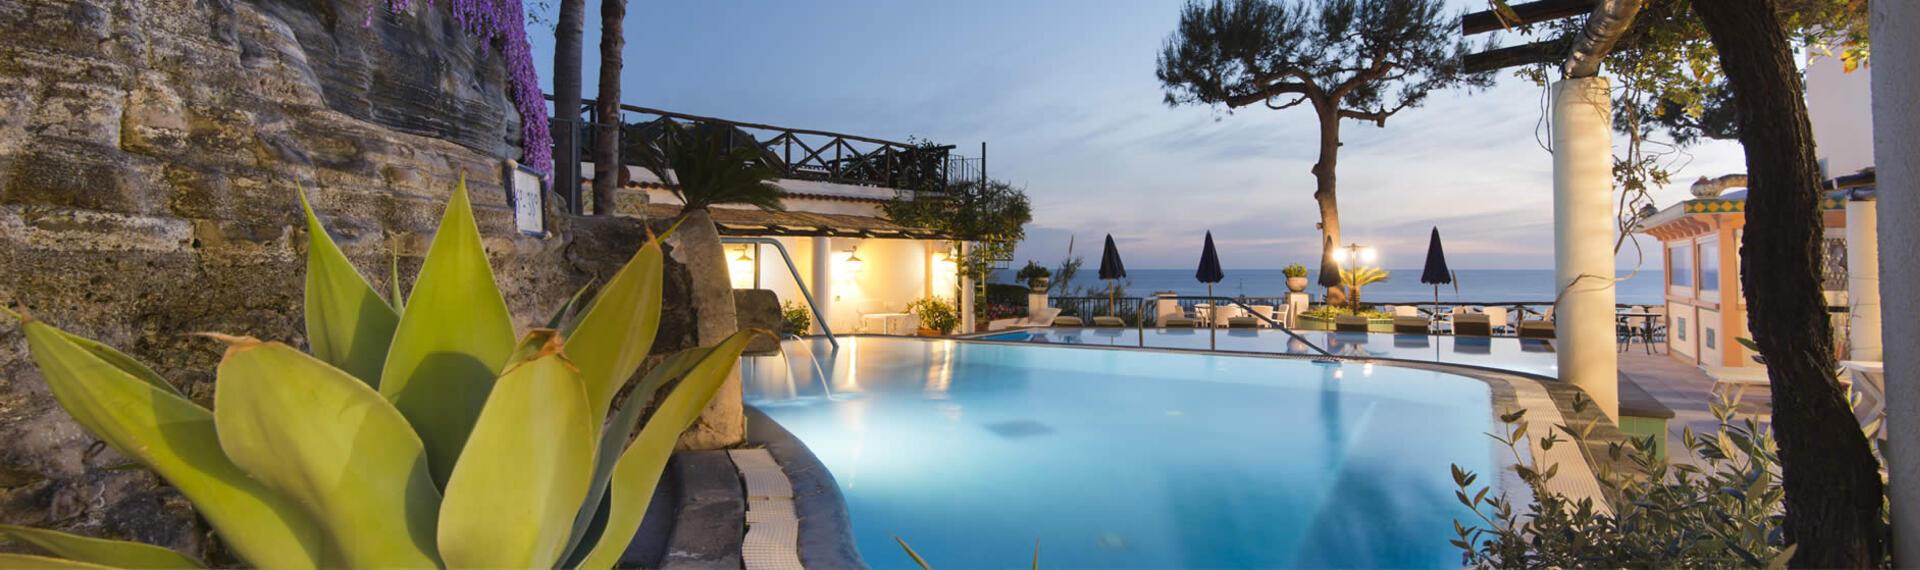 hotelvillabianca it offerta-primavera-a-forio-d-ischia 010